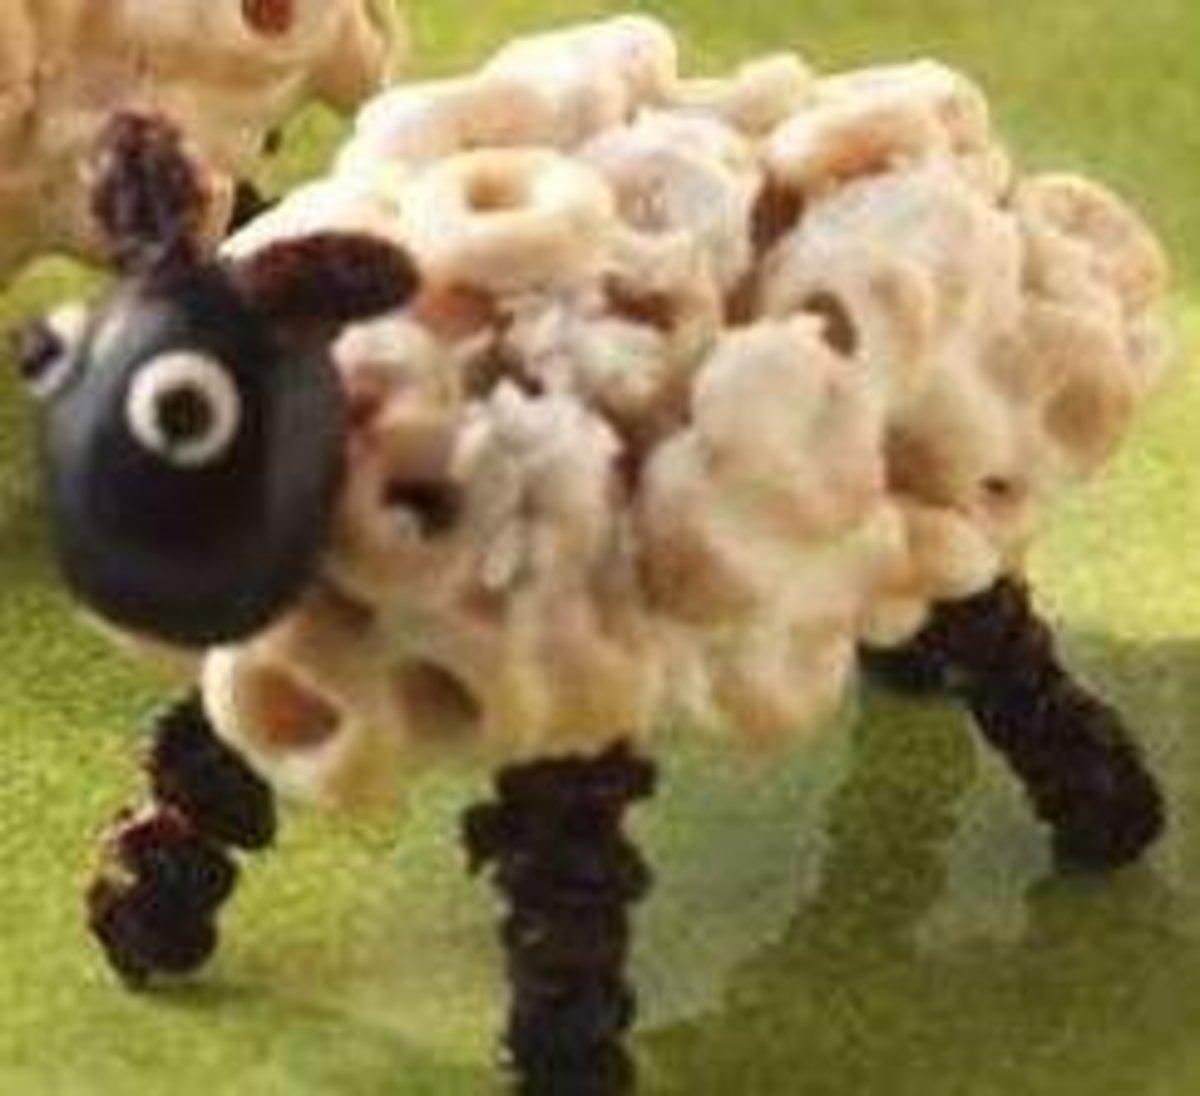 Idea and image credit: http://madhousefamilyreviews.blogspot.com/2011/04/great-kids-activity-fun-edible-food-art.html